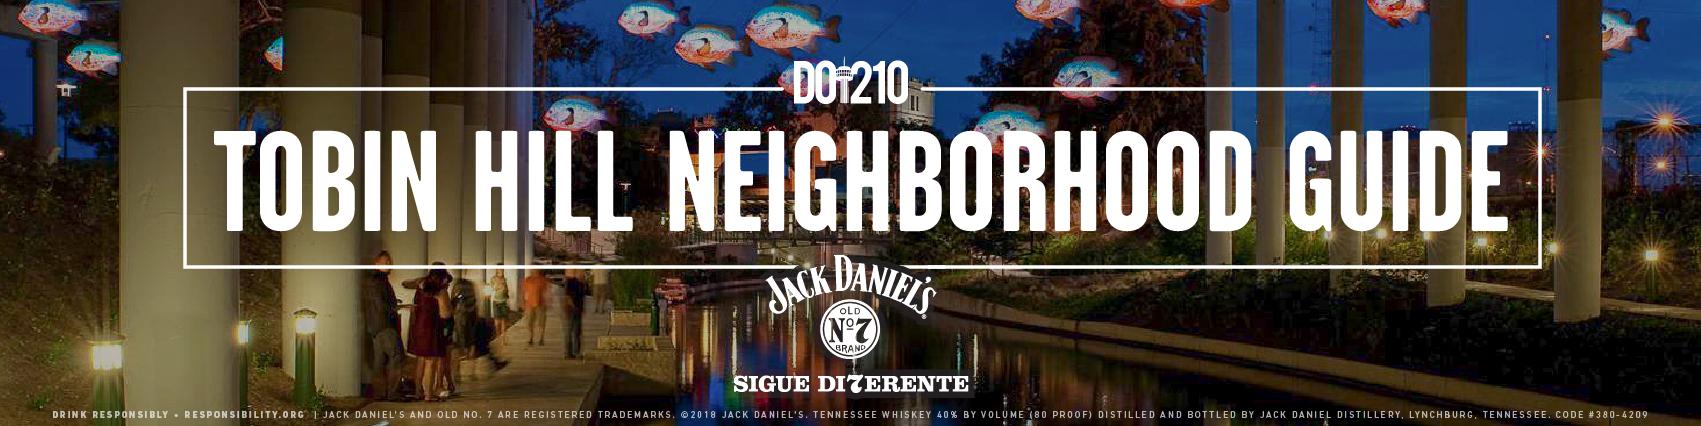 Do210_JD_Tobin Hill Neighborhood Guide_MIddle Listing.jpg